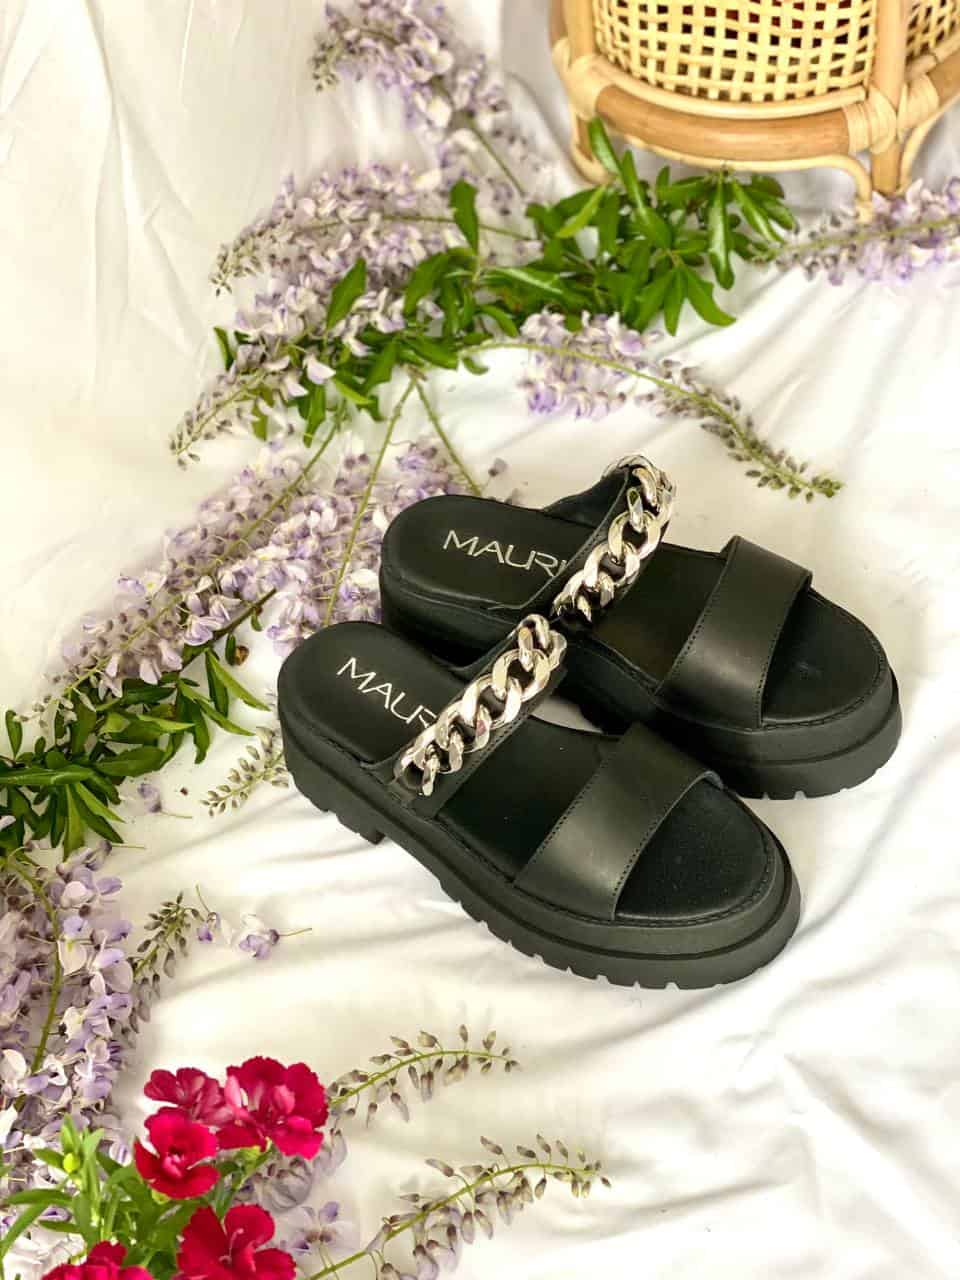 sandale-piele-naturala-anais (9)